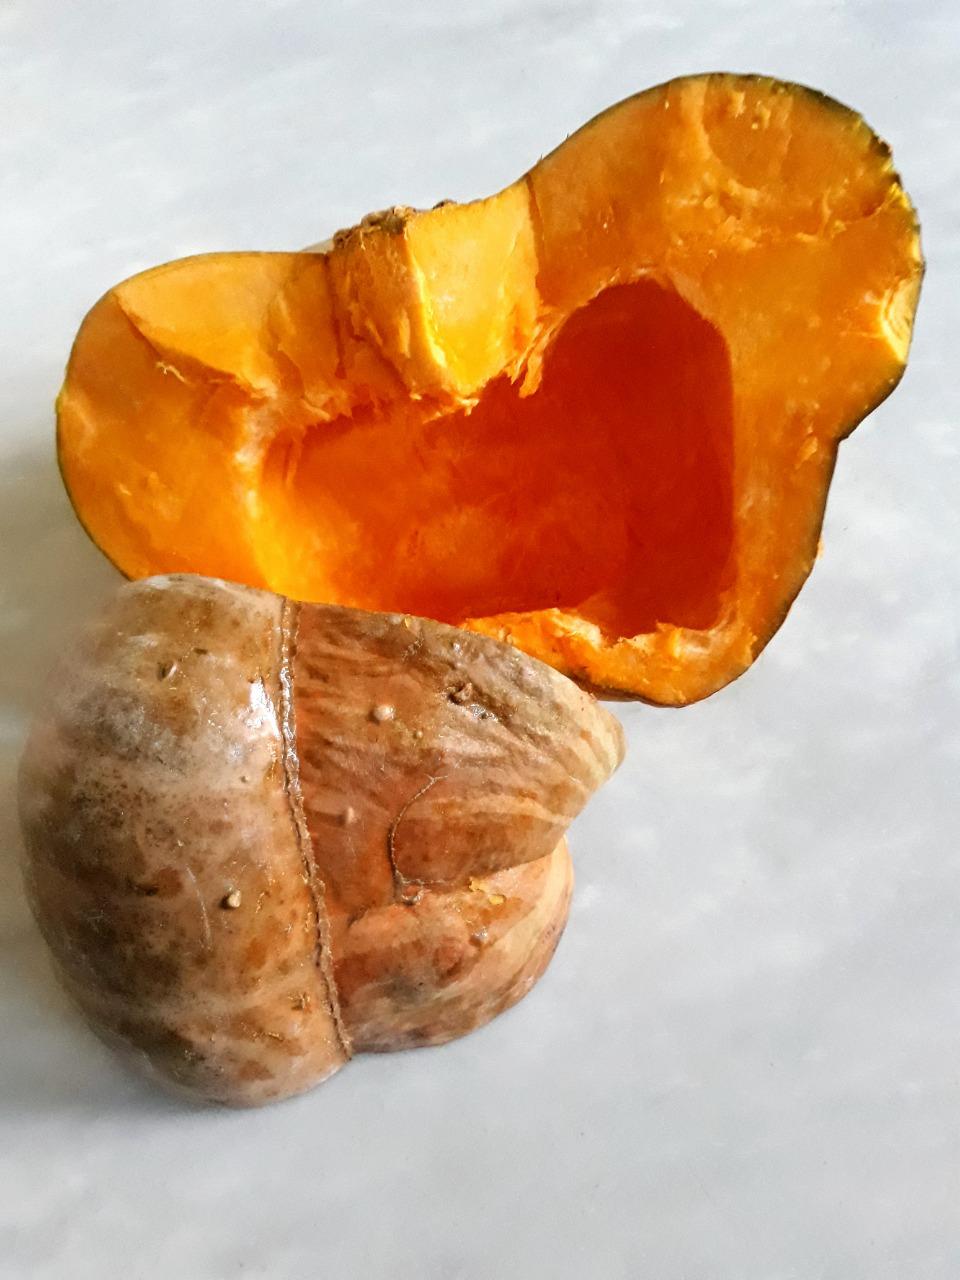 Zucca bertagnina di Dorno tagliata a metà